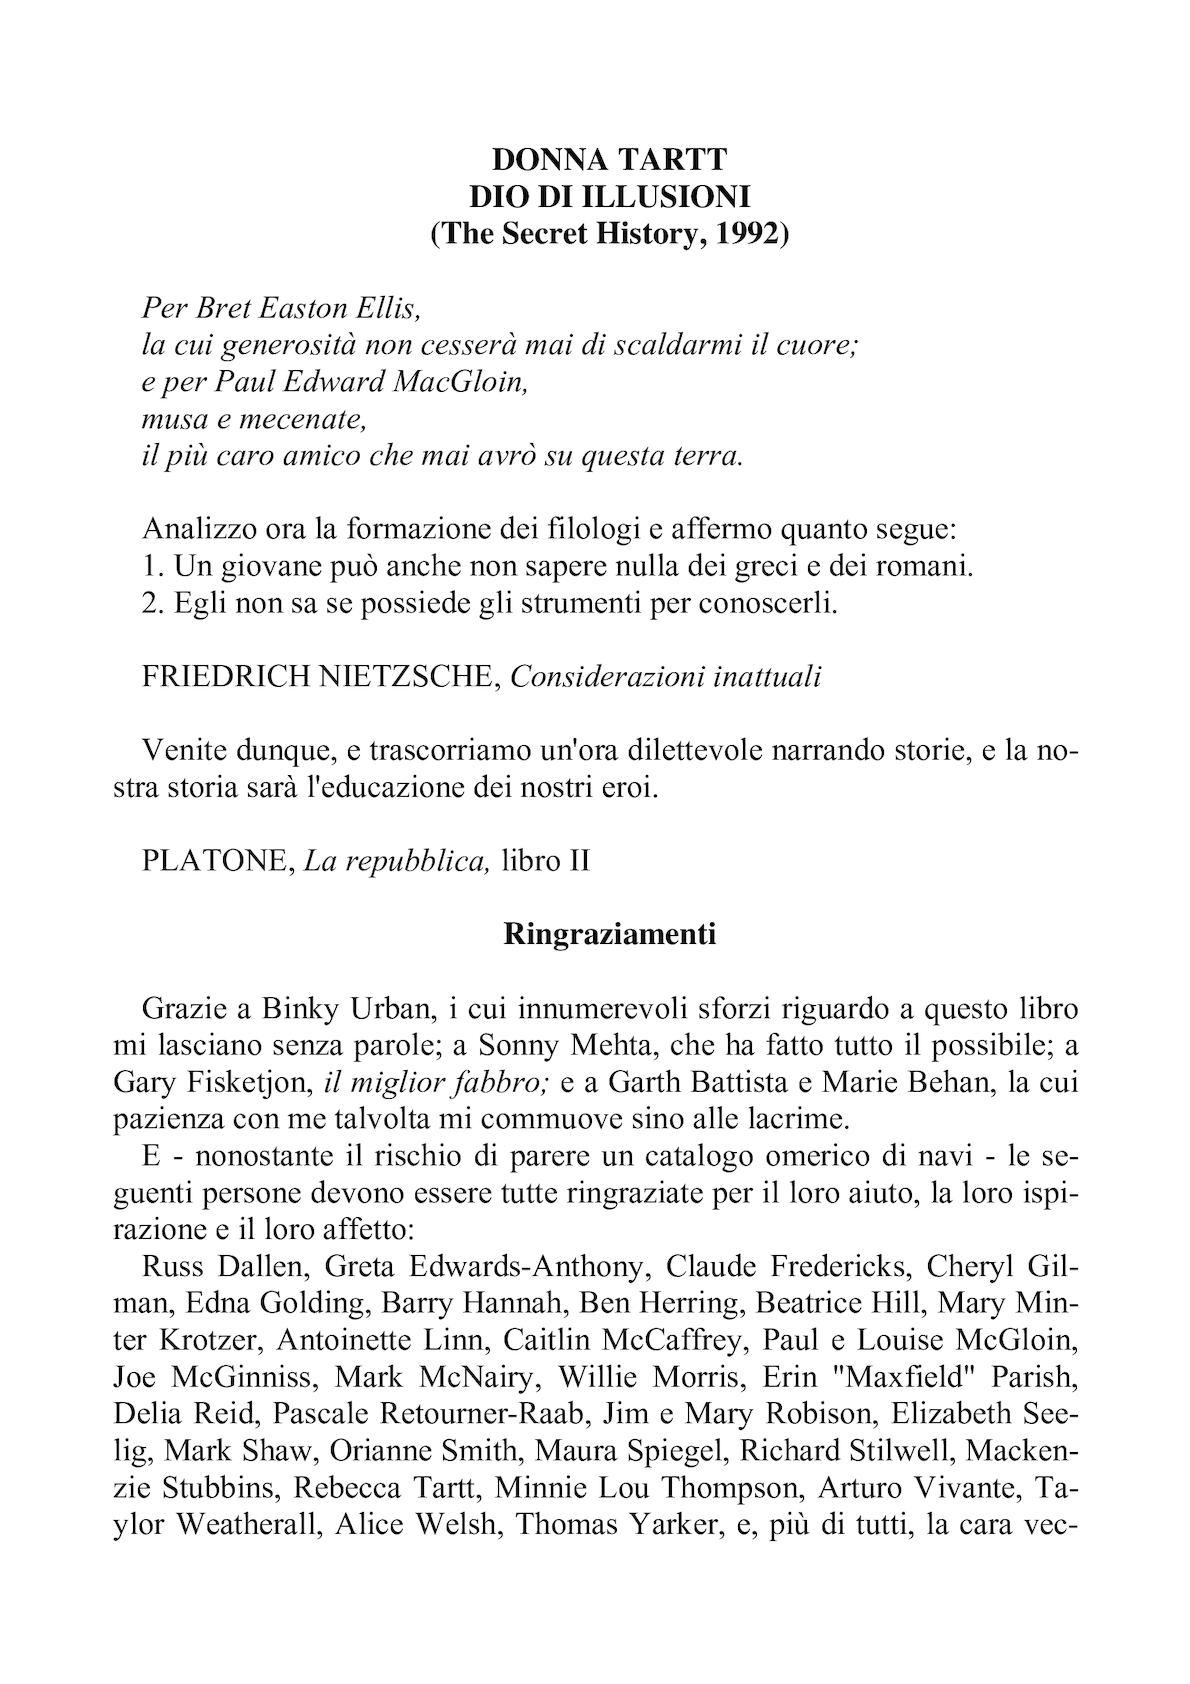 26f52437a3d9 Calaméo - Tartt Donna Dio Di Illusioni